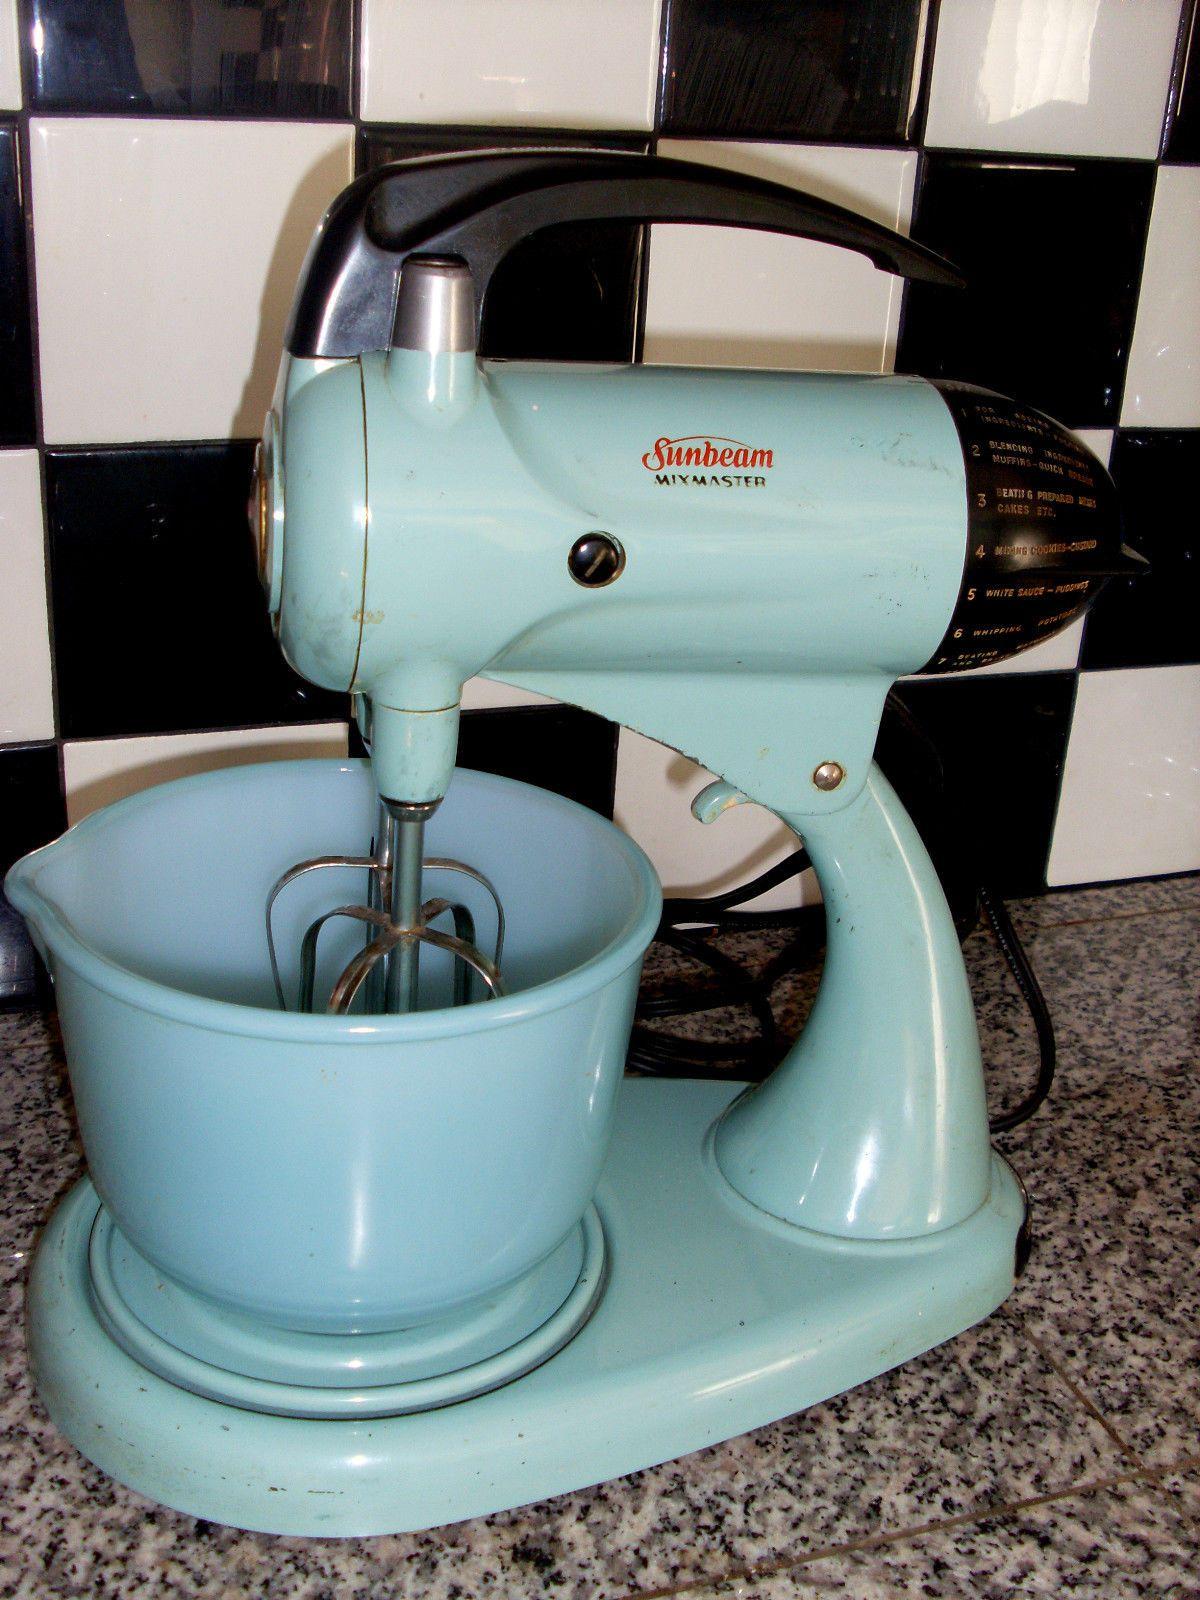 1950s Sunbeam Aqua Turquoise Green Mixmaster Mixer w Matching Bowl ...